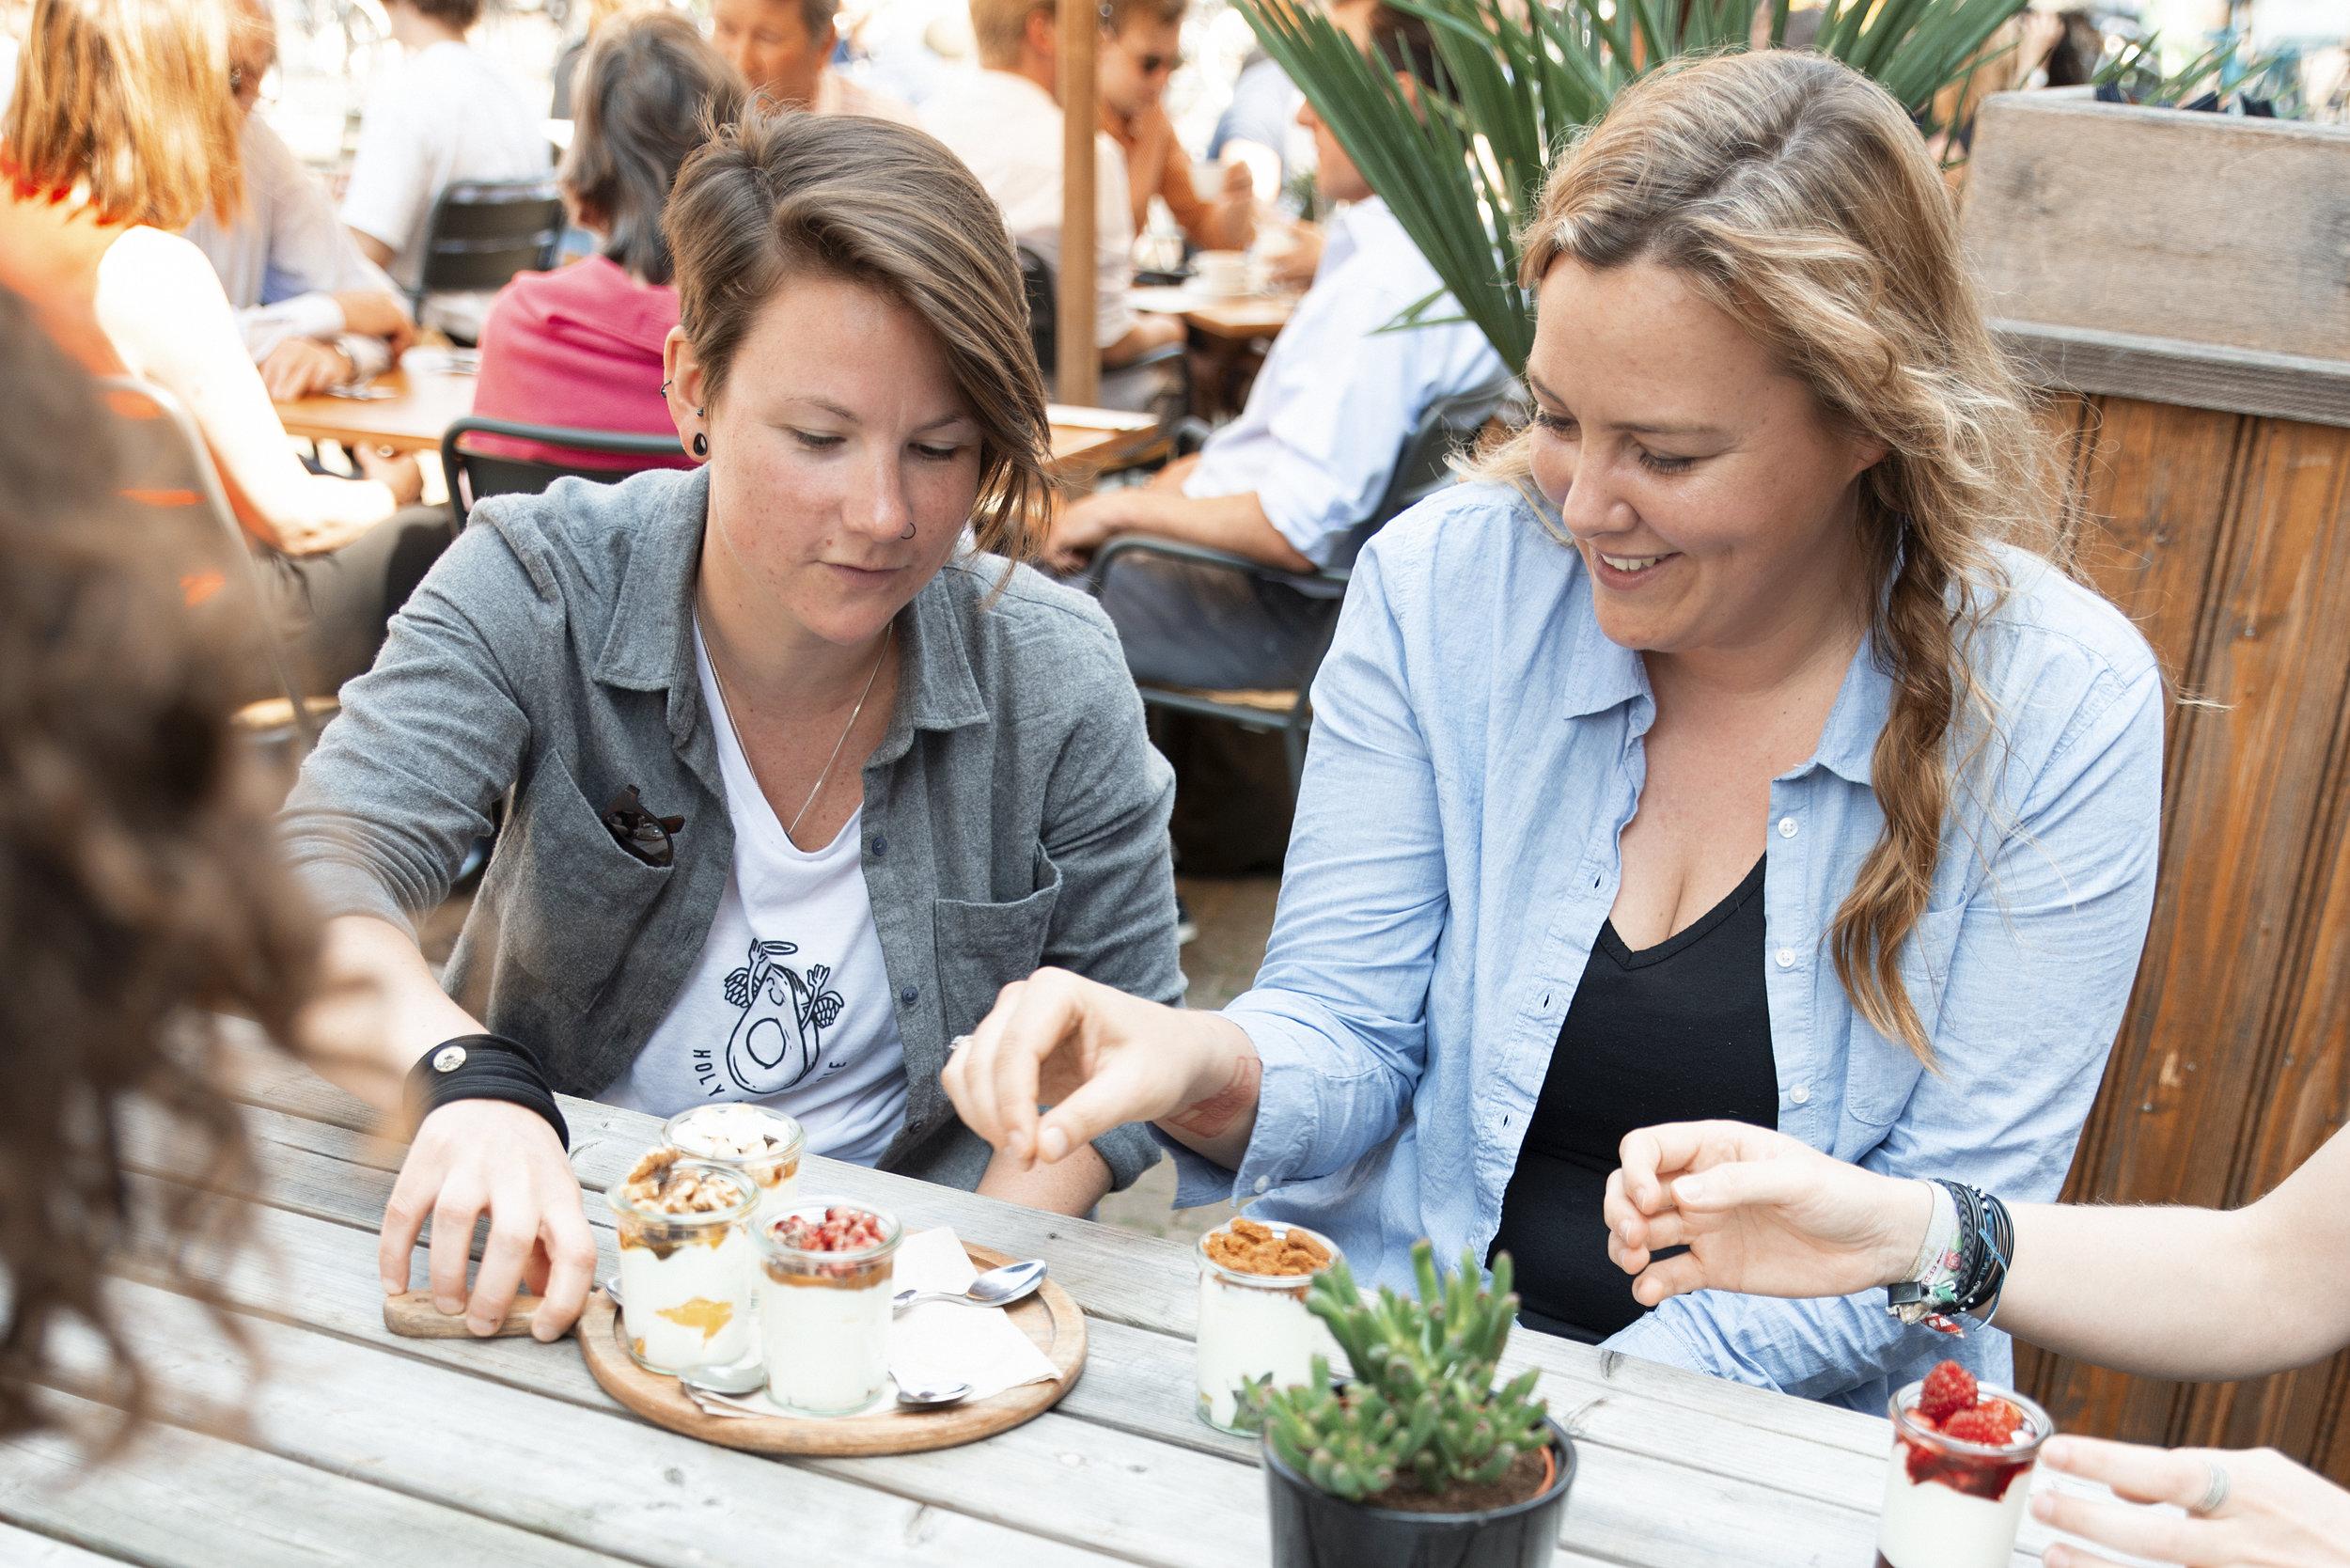 Food tour - Tijdens deze middag ontdek je Den Haag al wandelend en proevend langs o.a. delicatesse zaken, de bakker en lunch cafe's.